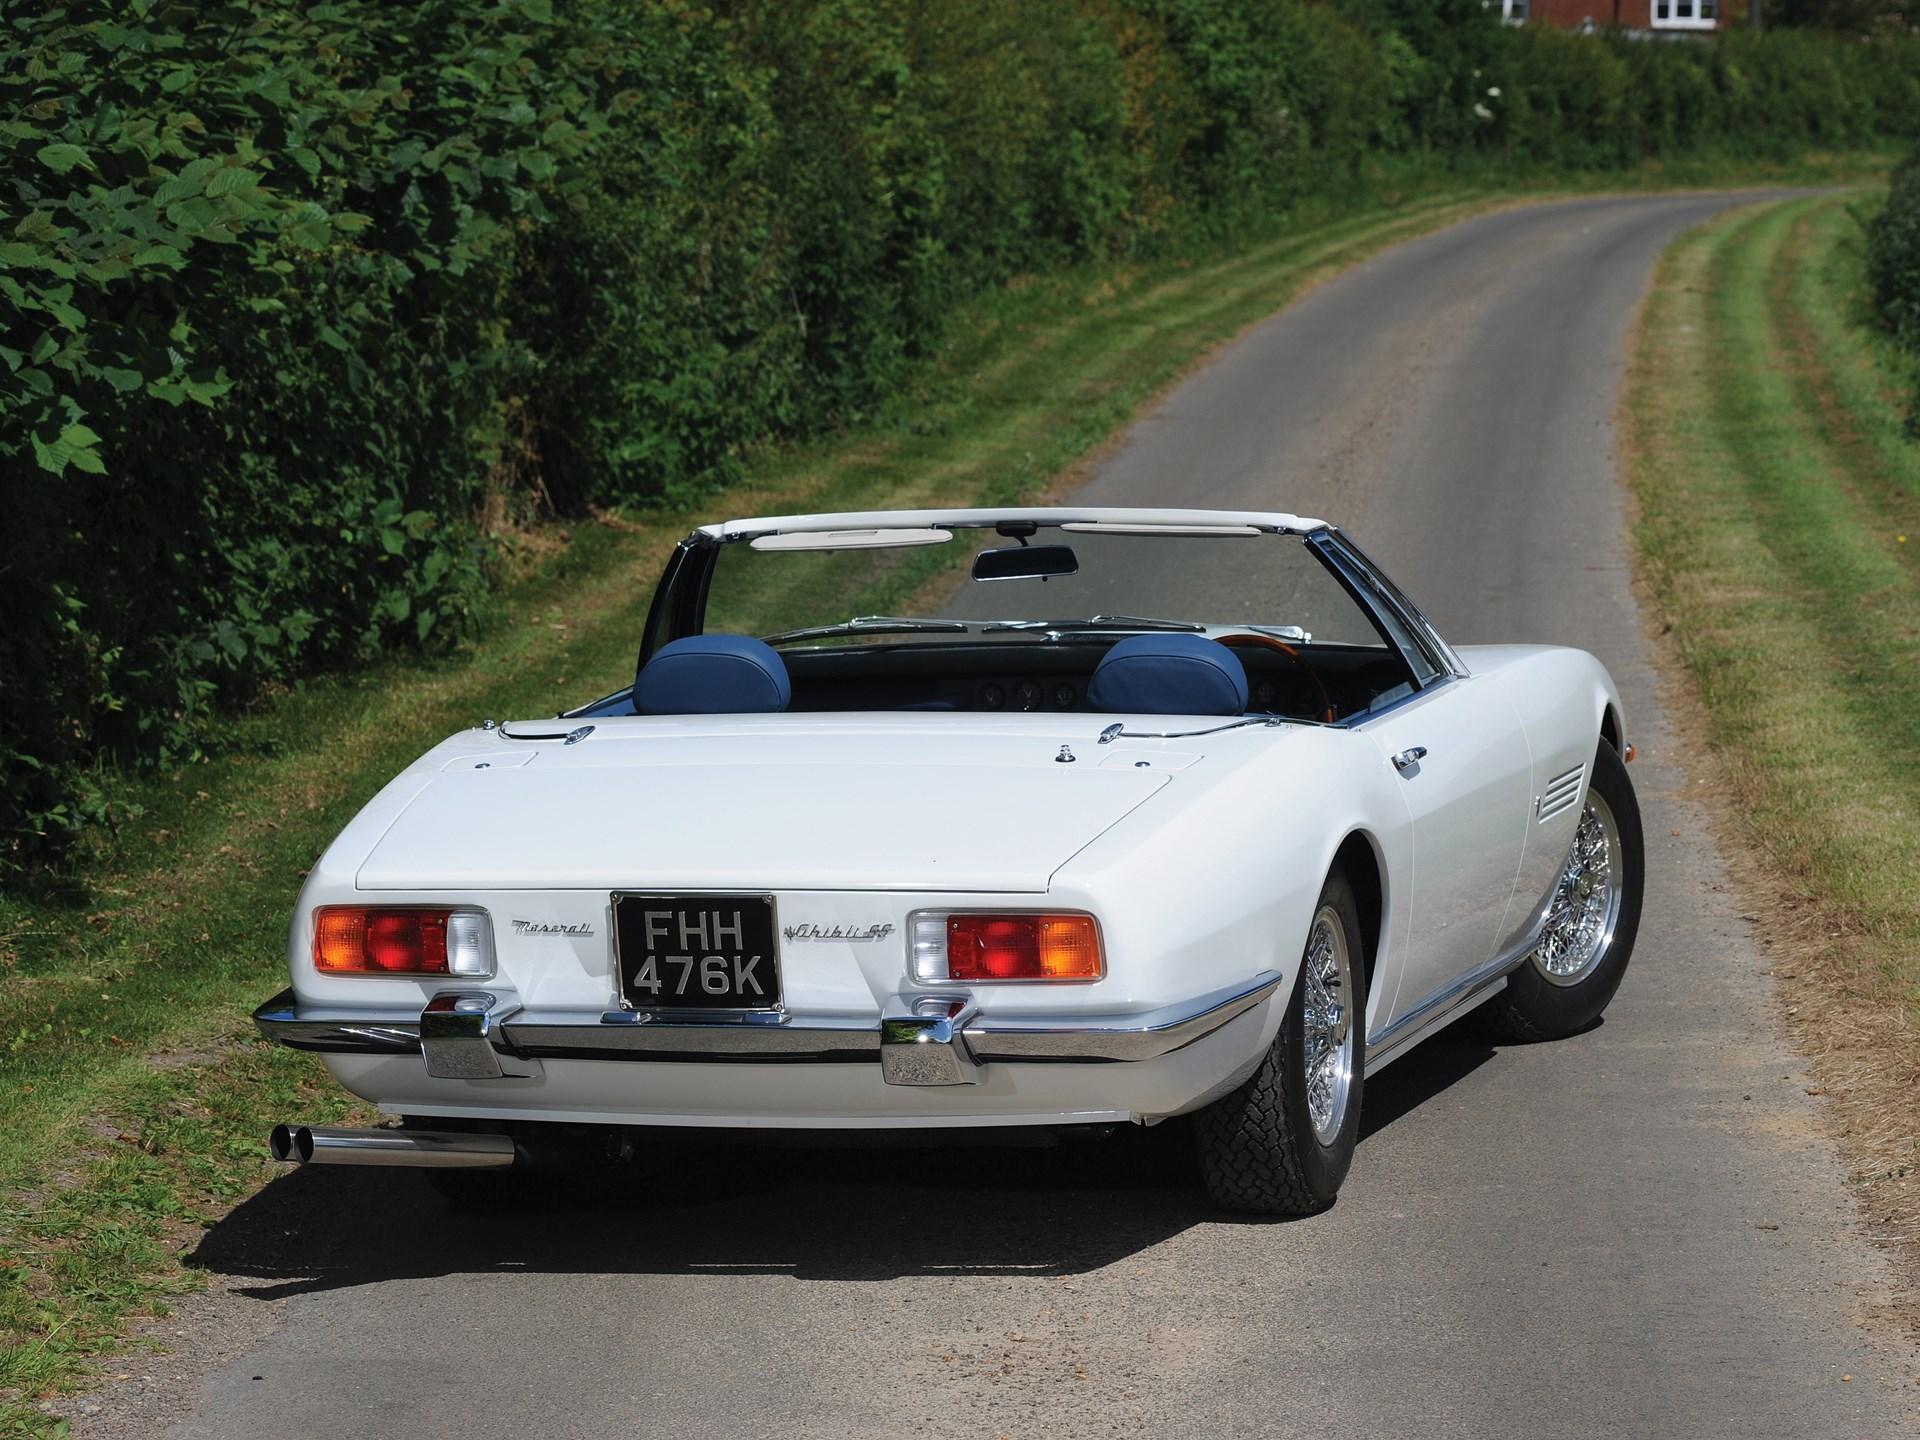 RM Sotheby's - 1972 Maserati Ghibli SS 4.9 Spyder by Ghia ...